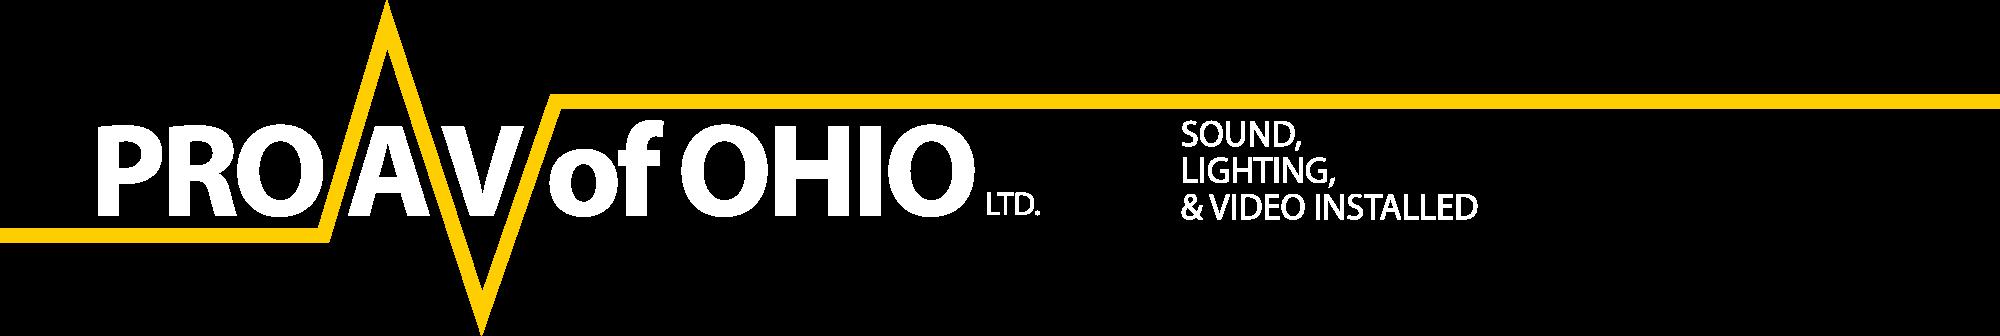 proavofohio.com